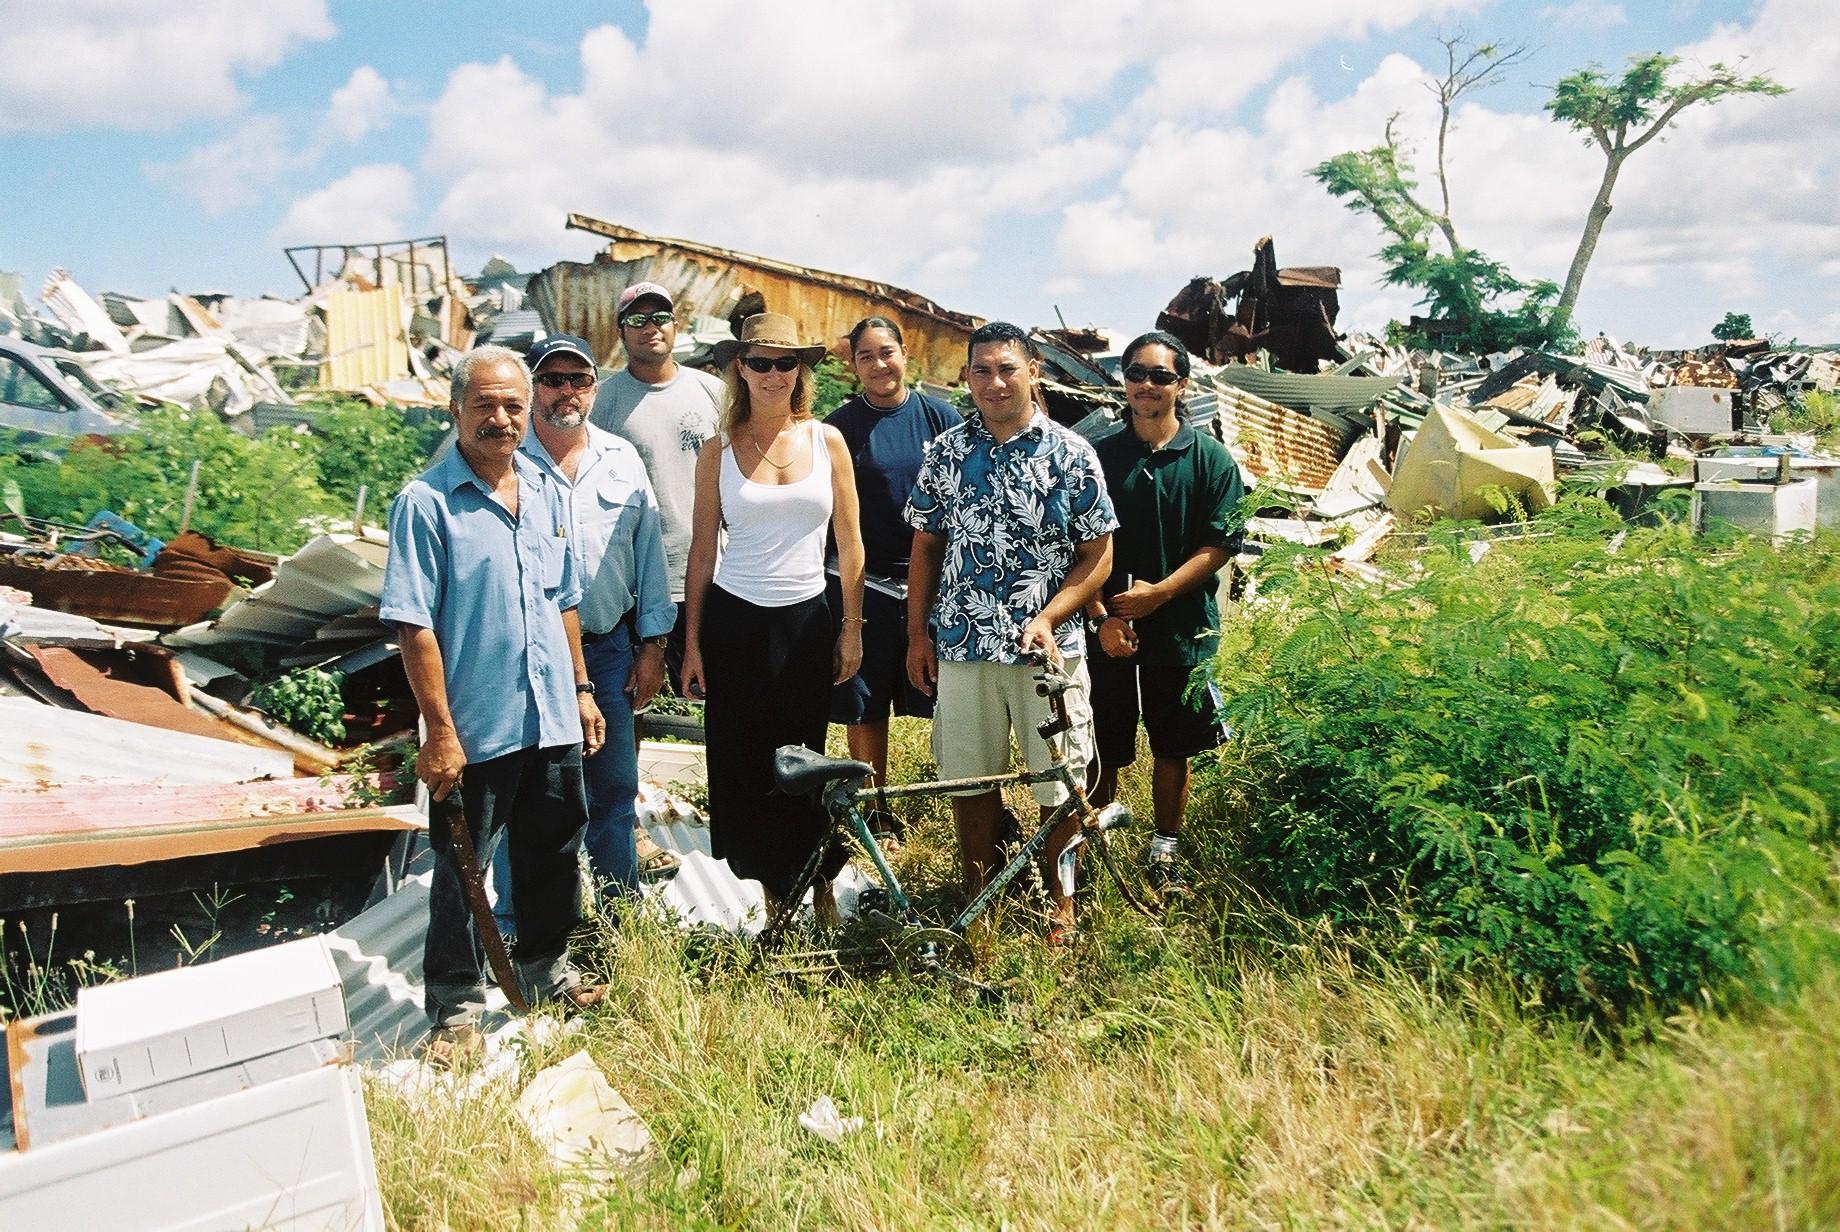 Nuie, petra, Nuieans and scrap metal in background.JPG